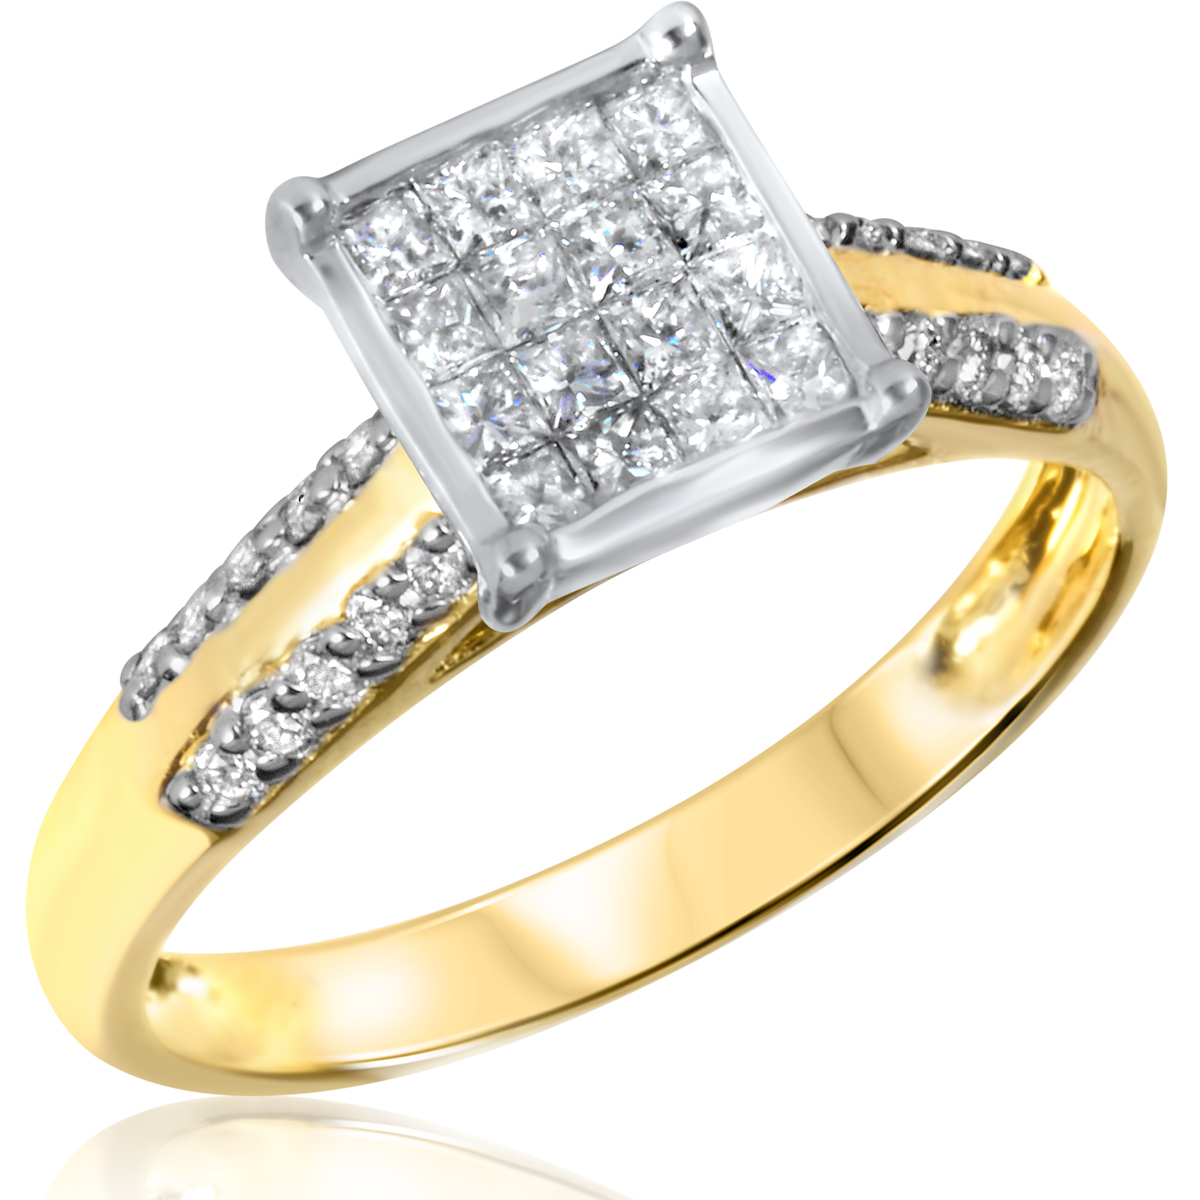 5/8 CT. T.W. Diamond Ladies Engagement Ring 10K Yellow Gold- Size 8